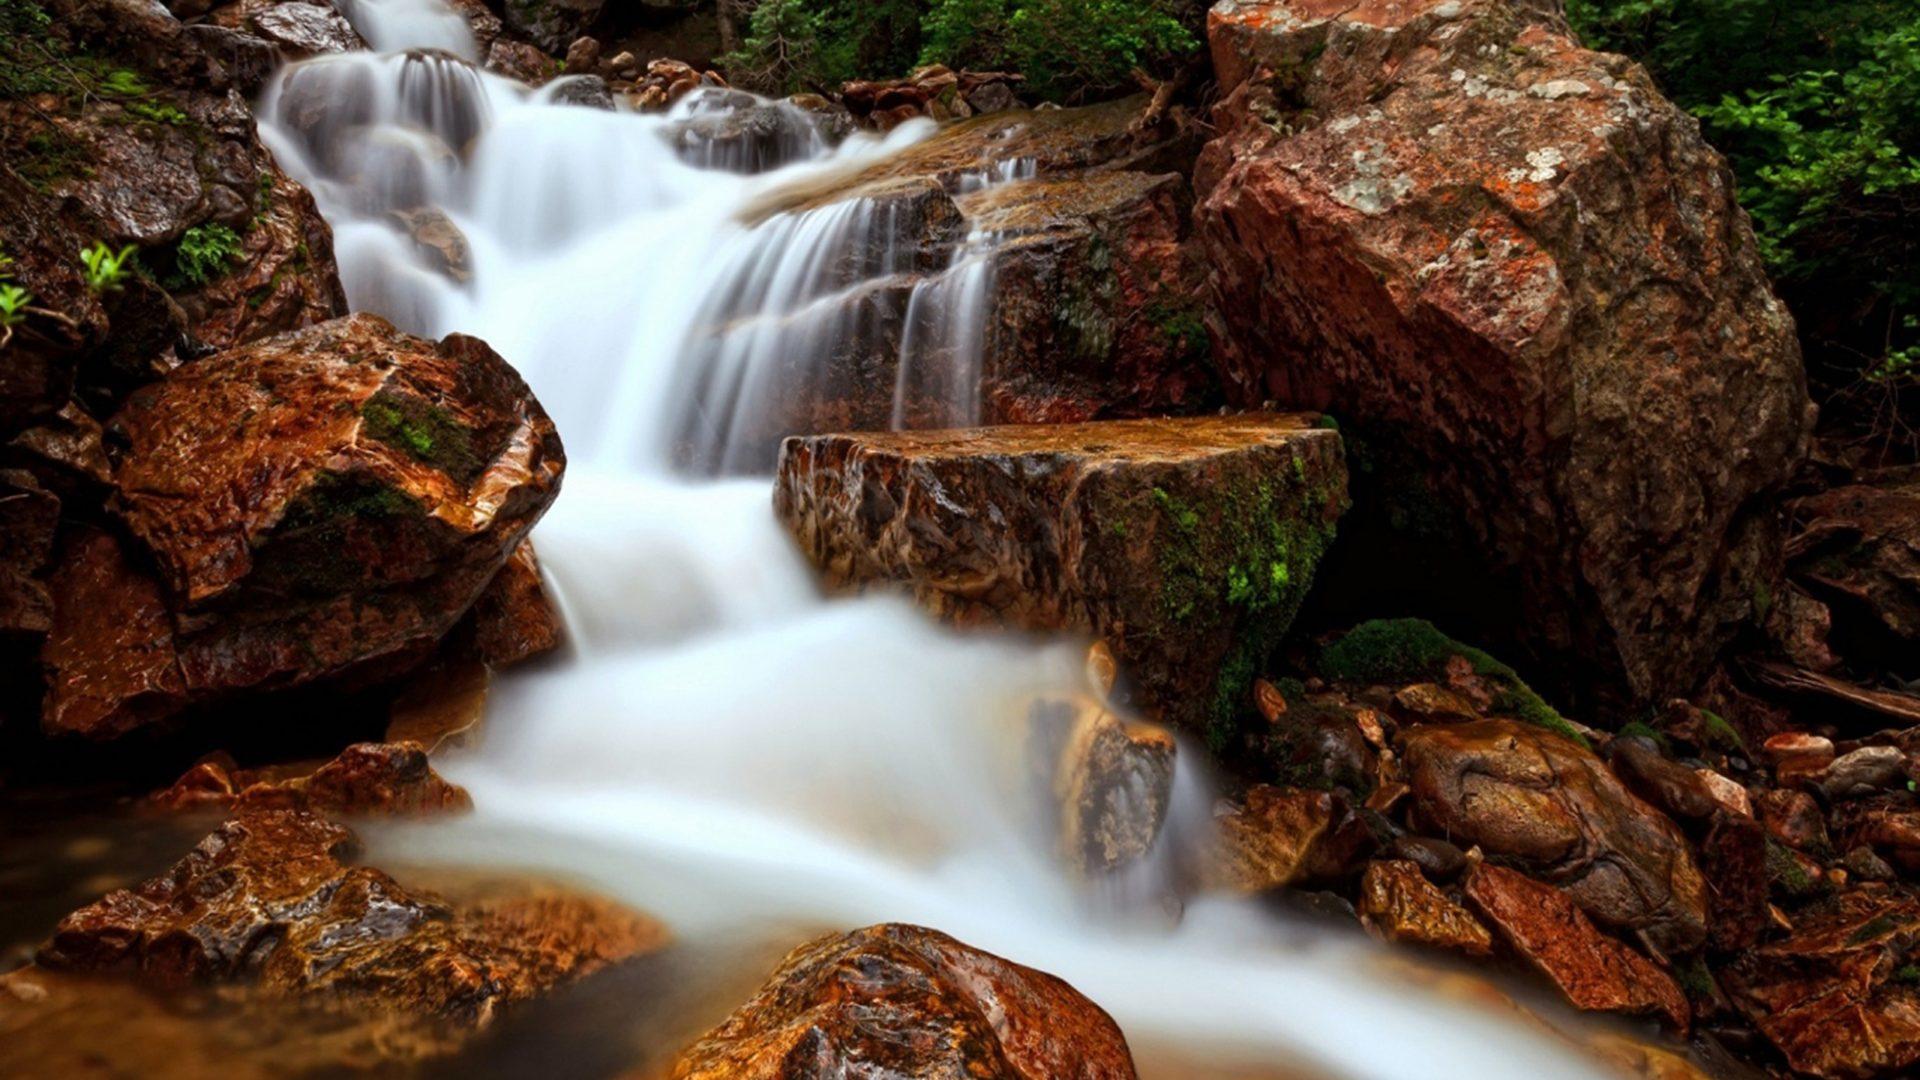 Smoky Mountains Fall Wallpaper Waterfall Flow Water Rock Beautiful Hd Wallpaper